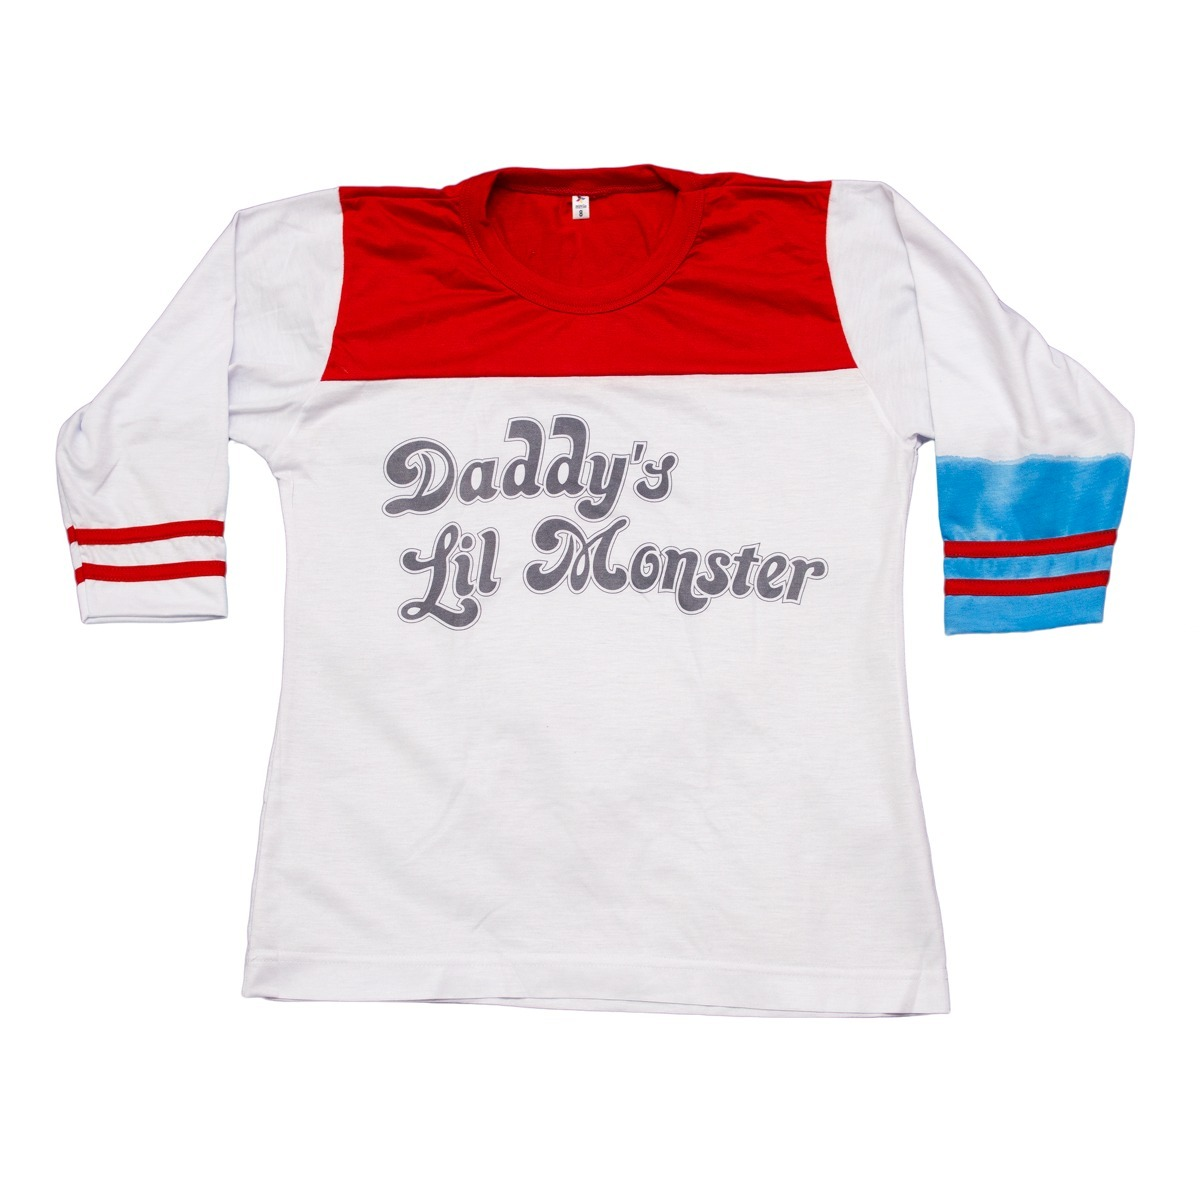 Camiseta arlequina infantil em mercado livre jpg 1200x1200 Camiseta  arlequina eb7dcaab59154